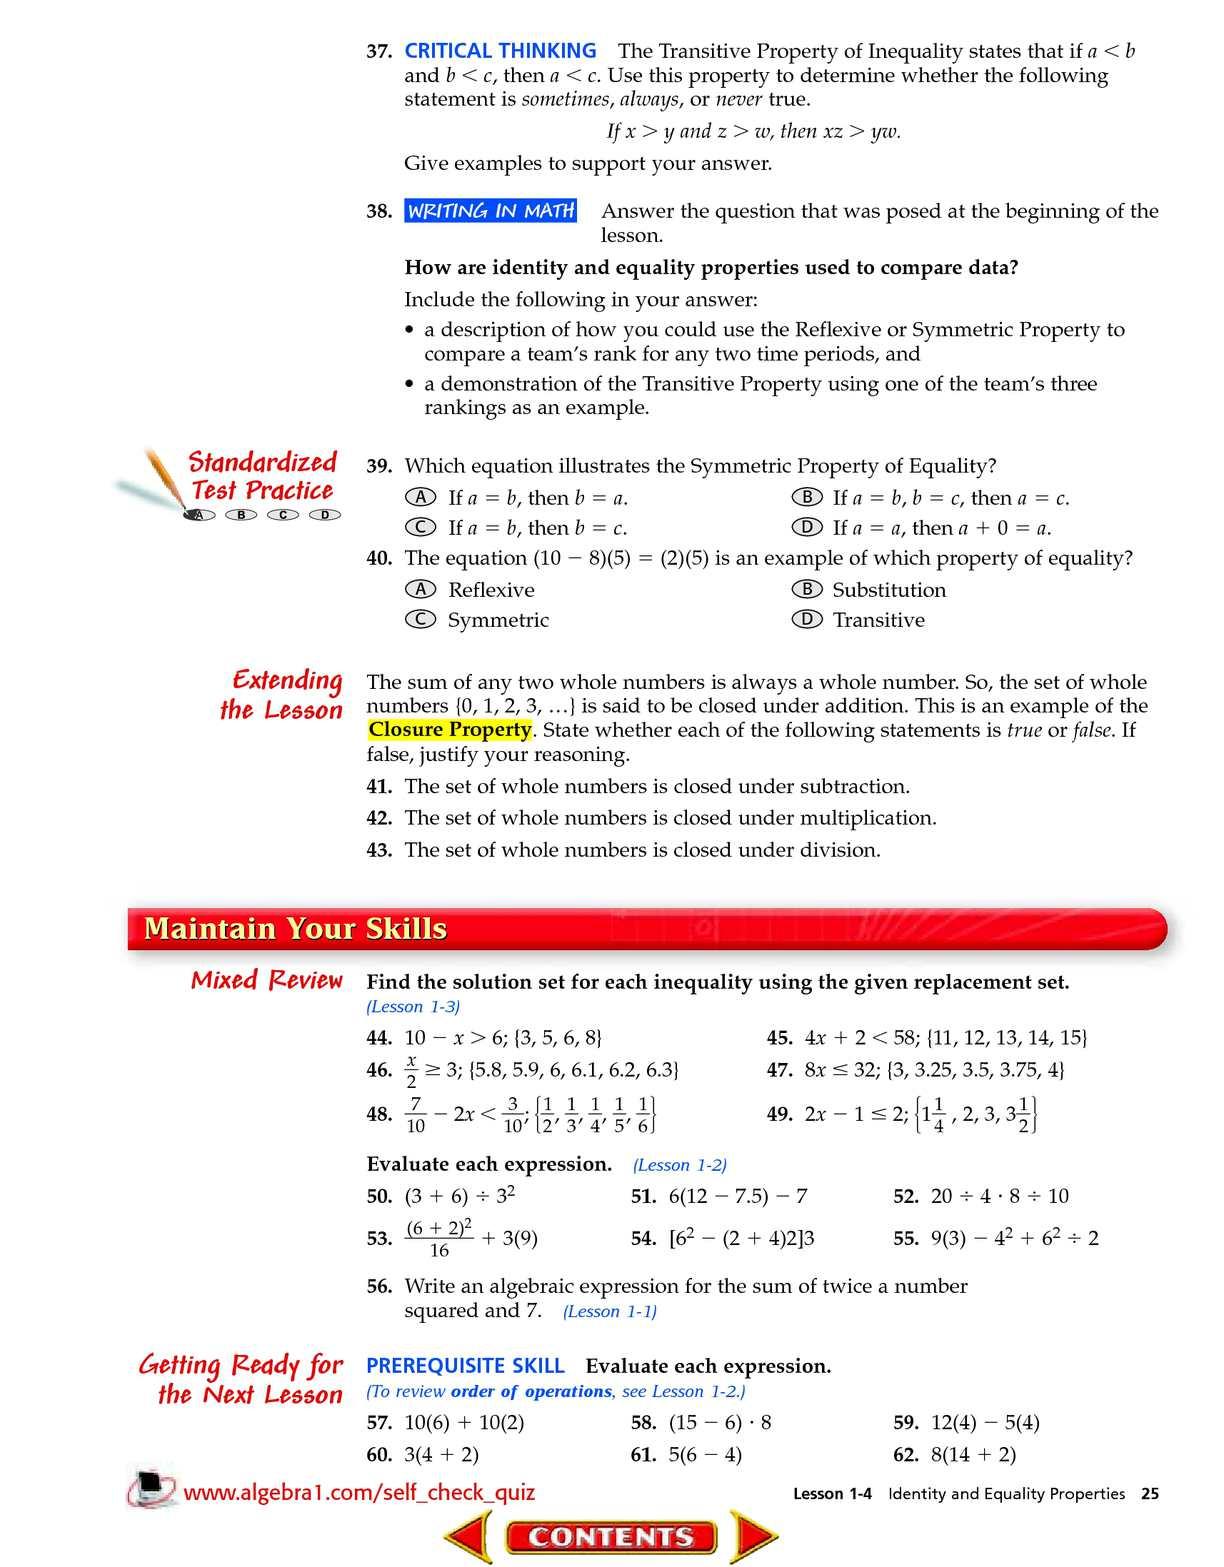 Algebra 1 McGraw-Hill - CALAMEO Downloader